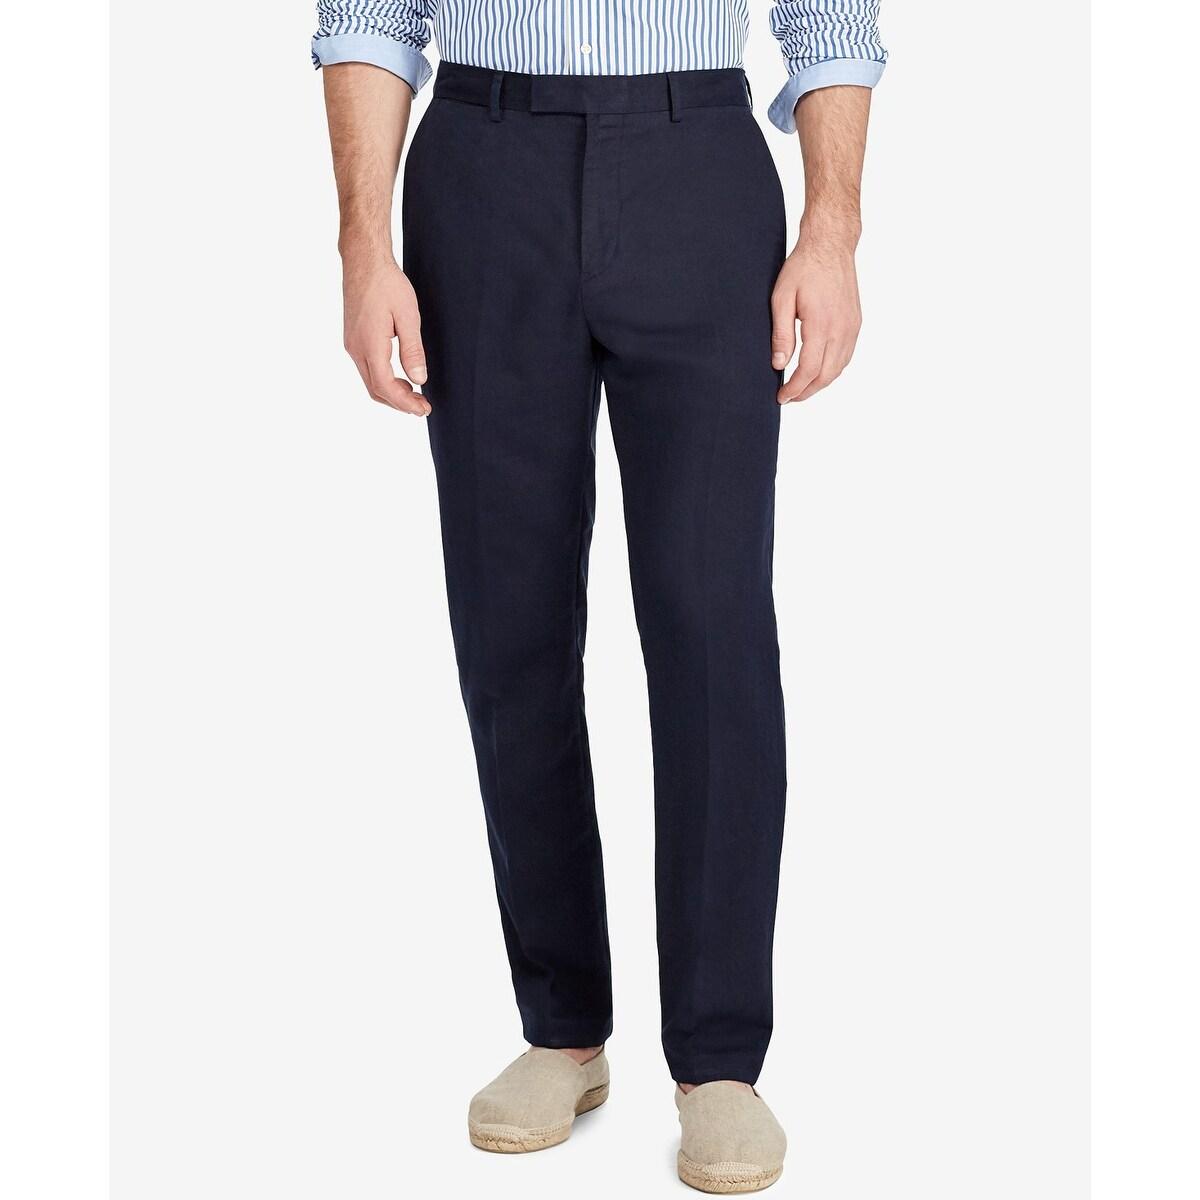 huge sale yet not vulgar complimentary shipping Polo Ralph Lauren Men's Classic-Fit Linen Pants Aviator Pants Navy Size 42